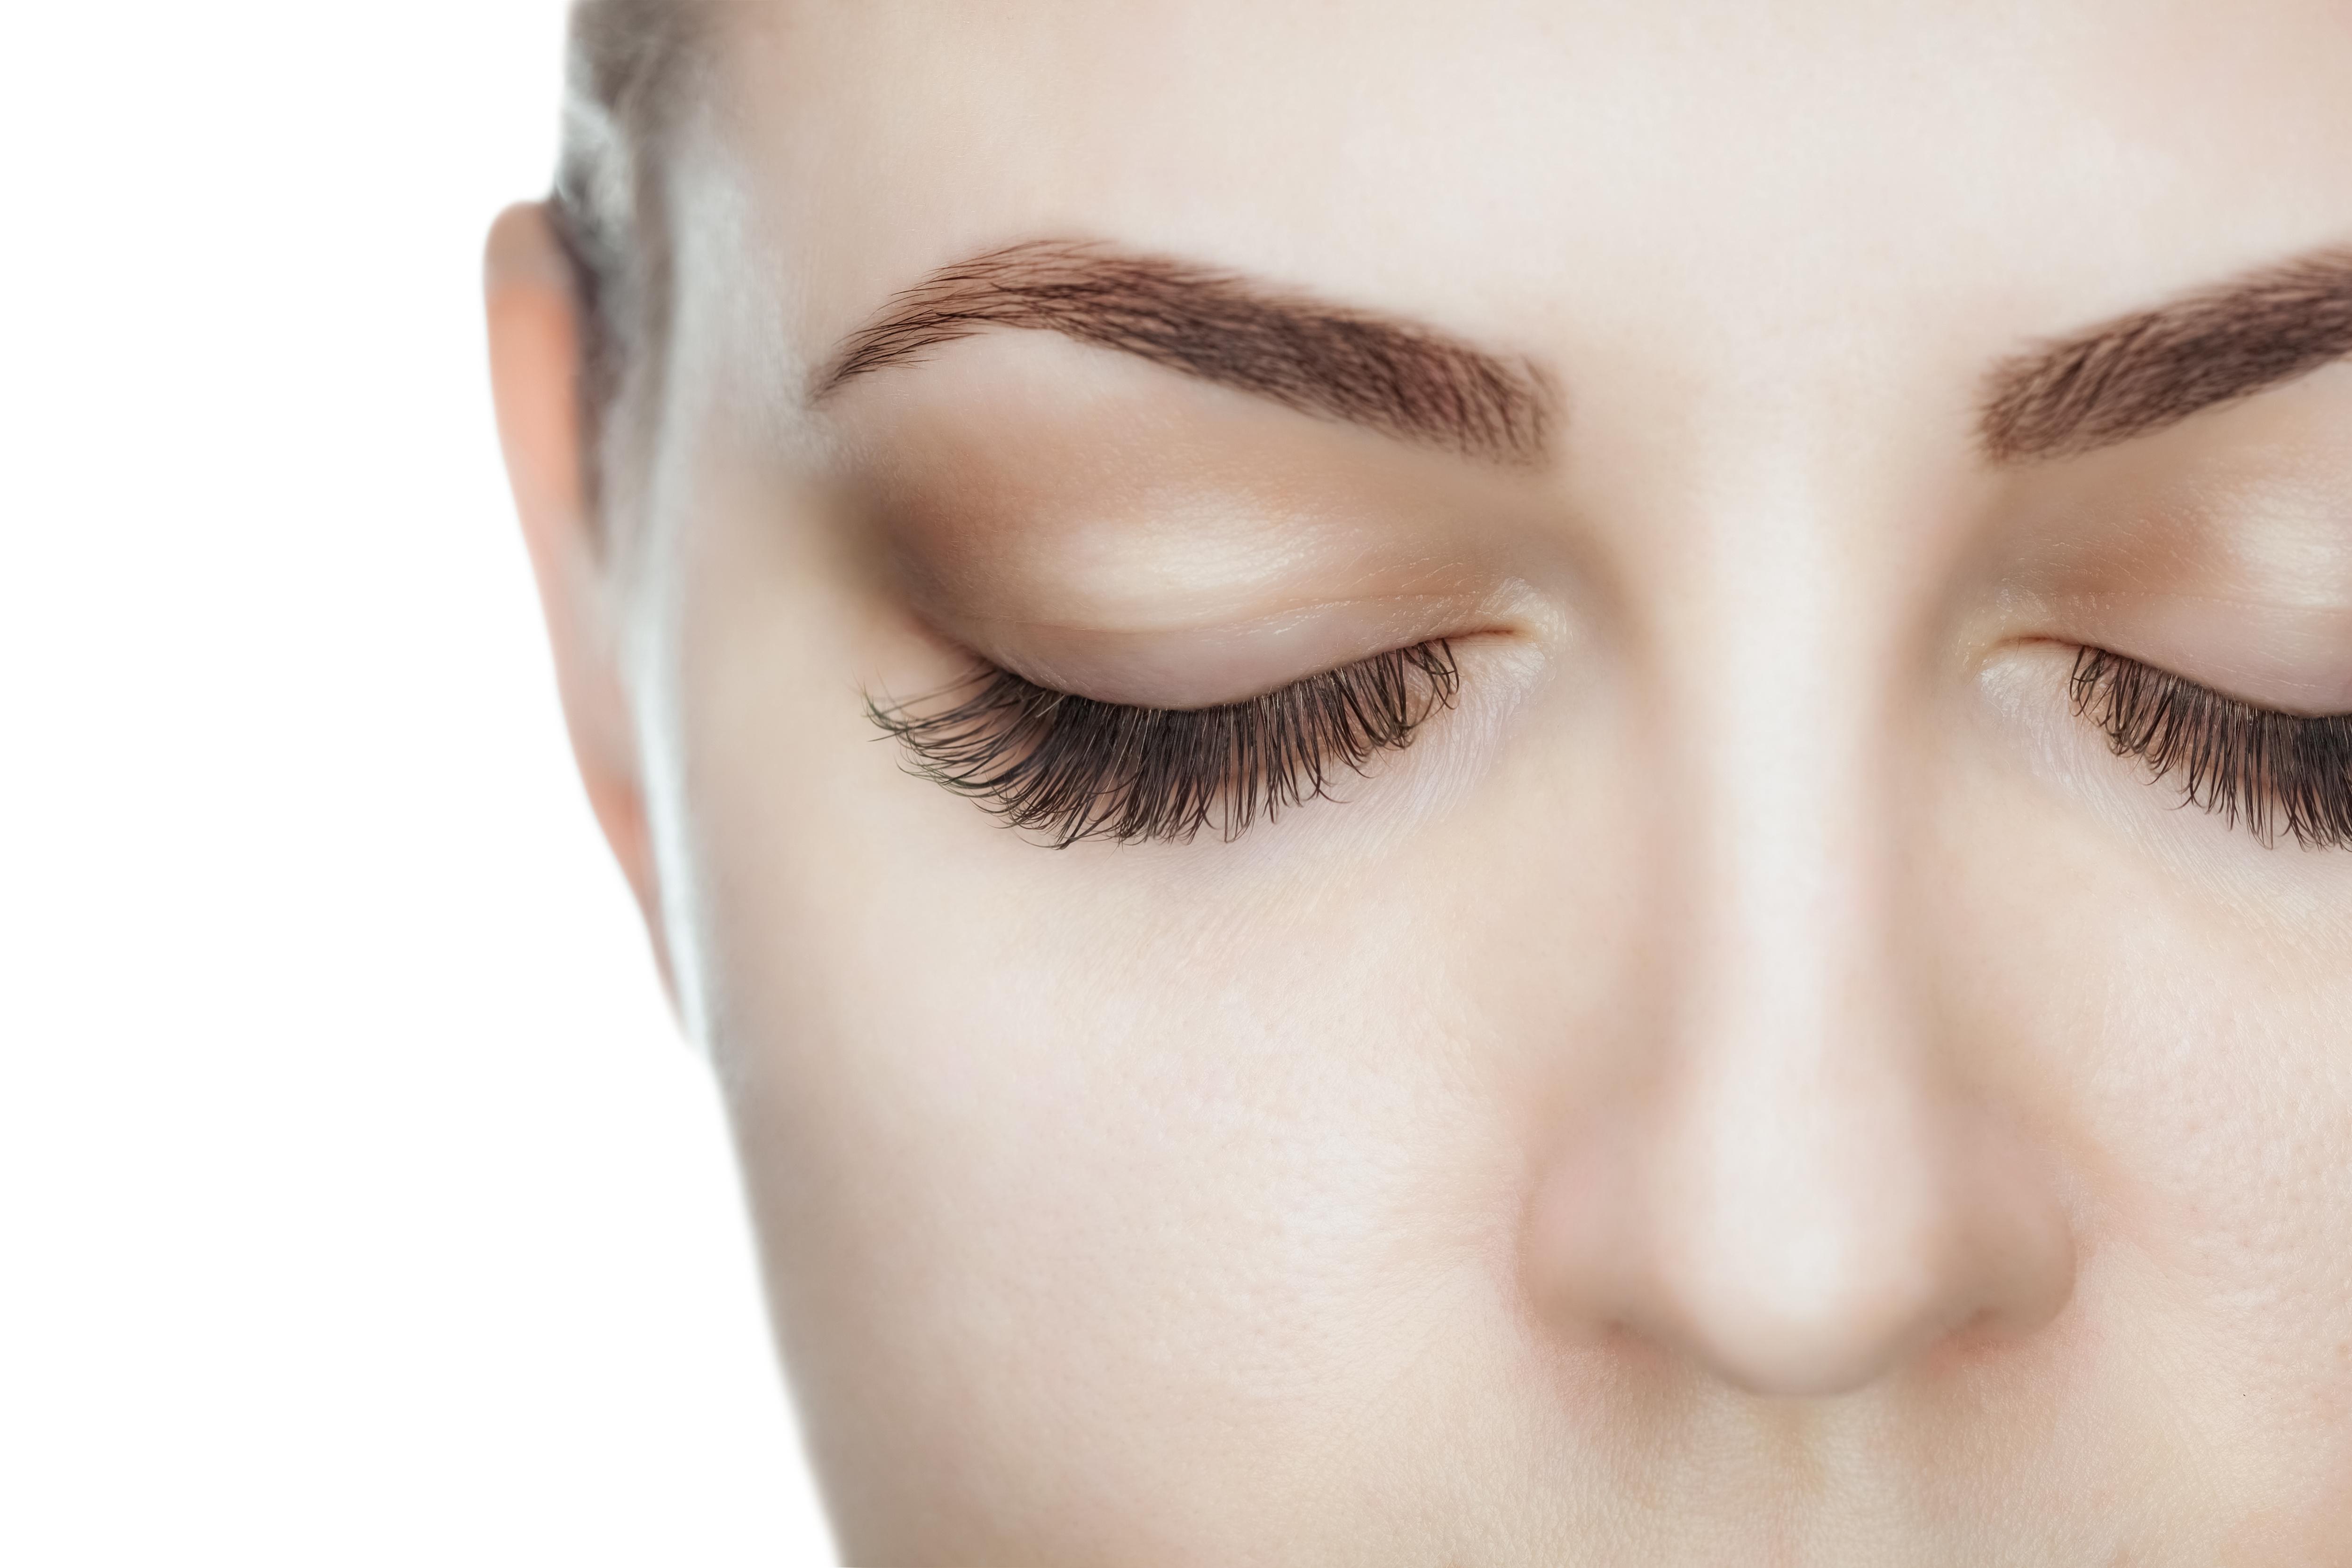 https://0901.nccdn.net/4_2/000/000/017/e75/Canva---Beautiful-Woman-with-long-lashes-in-a-beauty-salon.-5000x3333.jpg